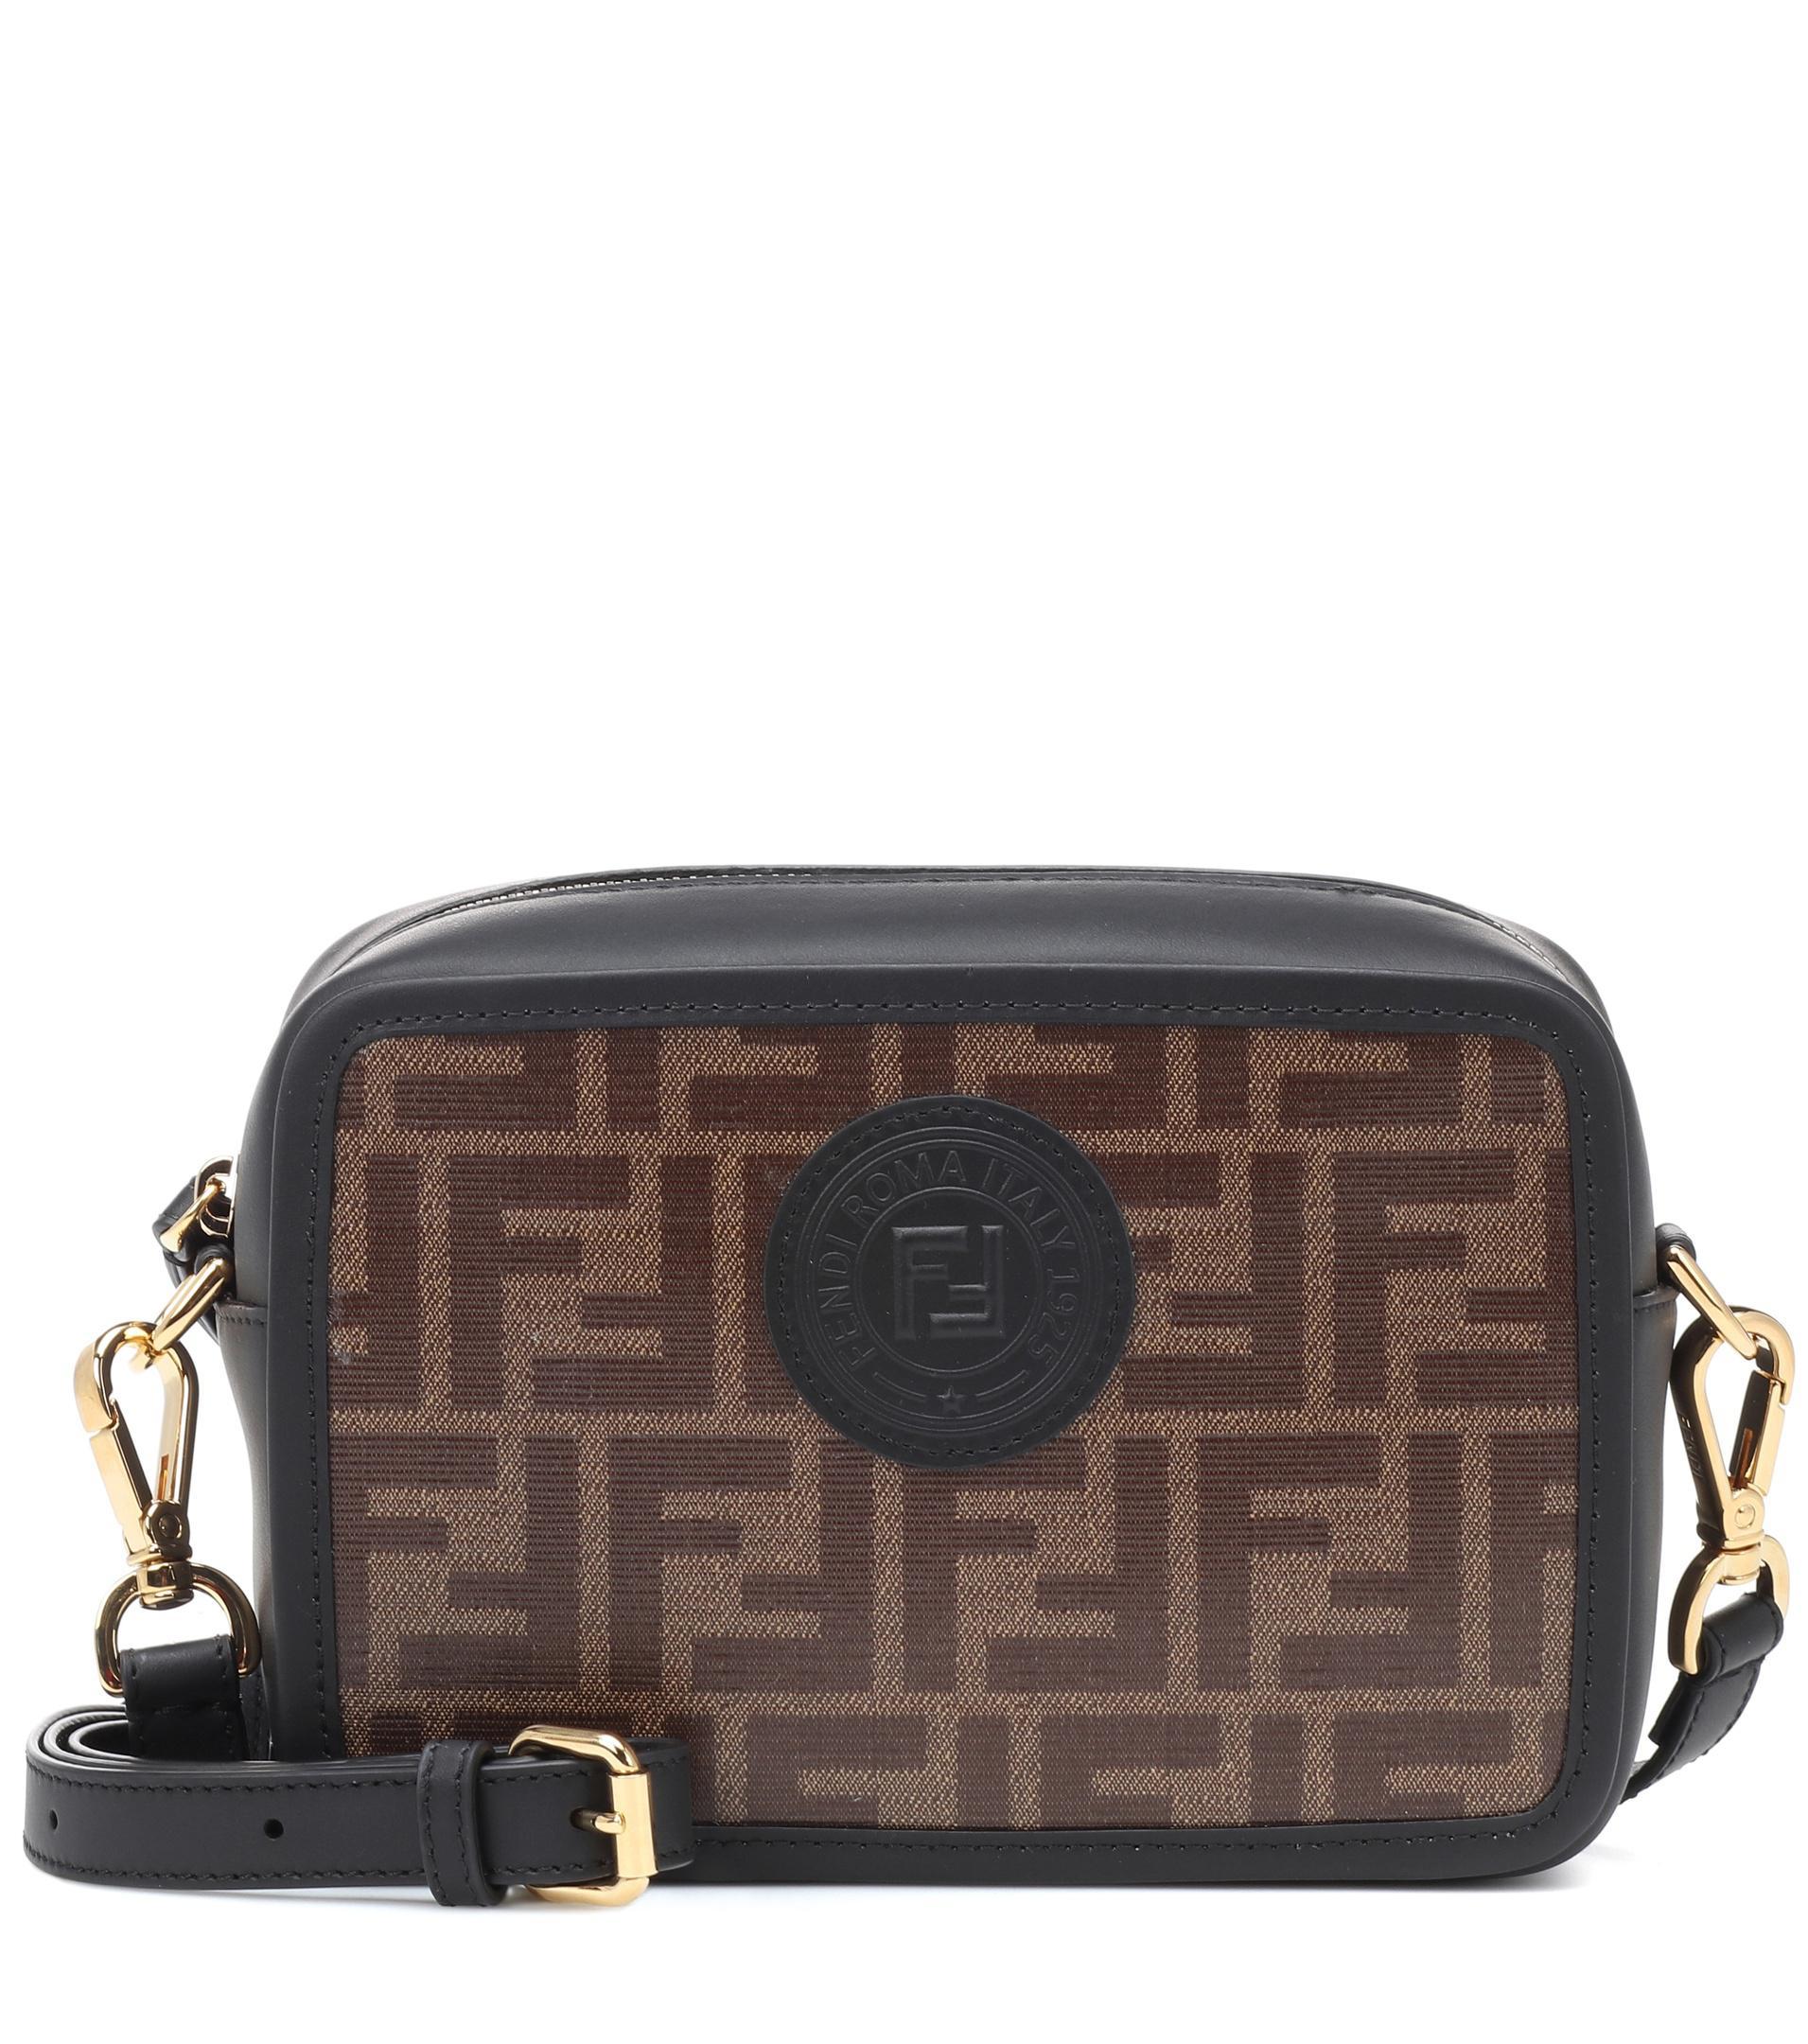 3692dfecf1ad Fendi Mini Logo Camera Bag in Brown - Save 3.4782608695652186% - Lyst